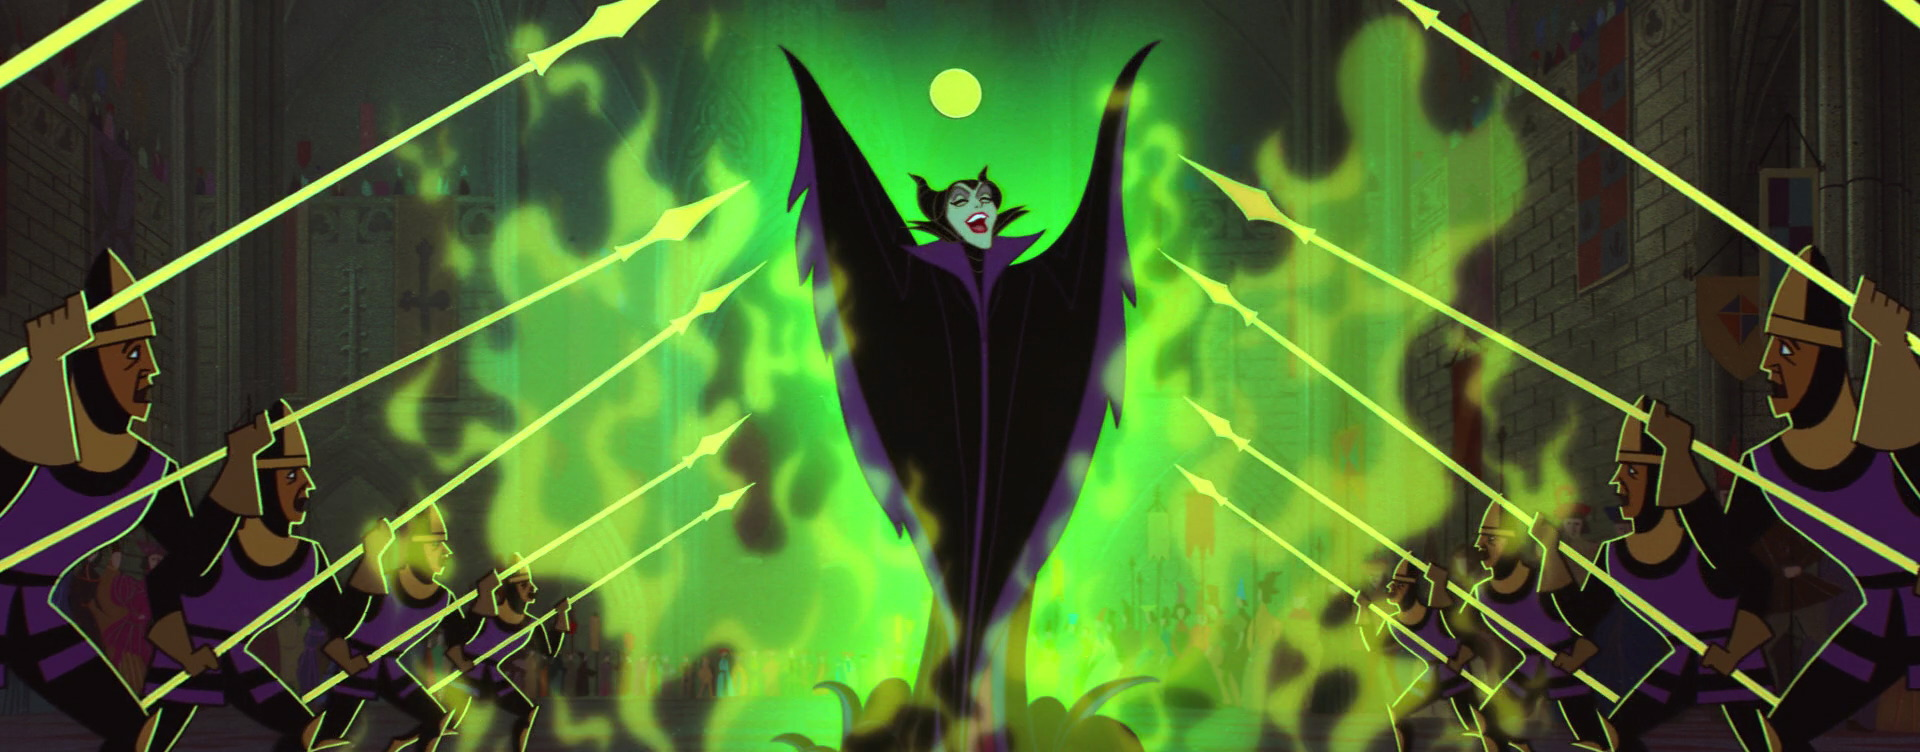 Animated Maleficent